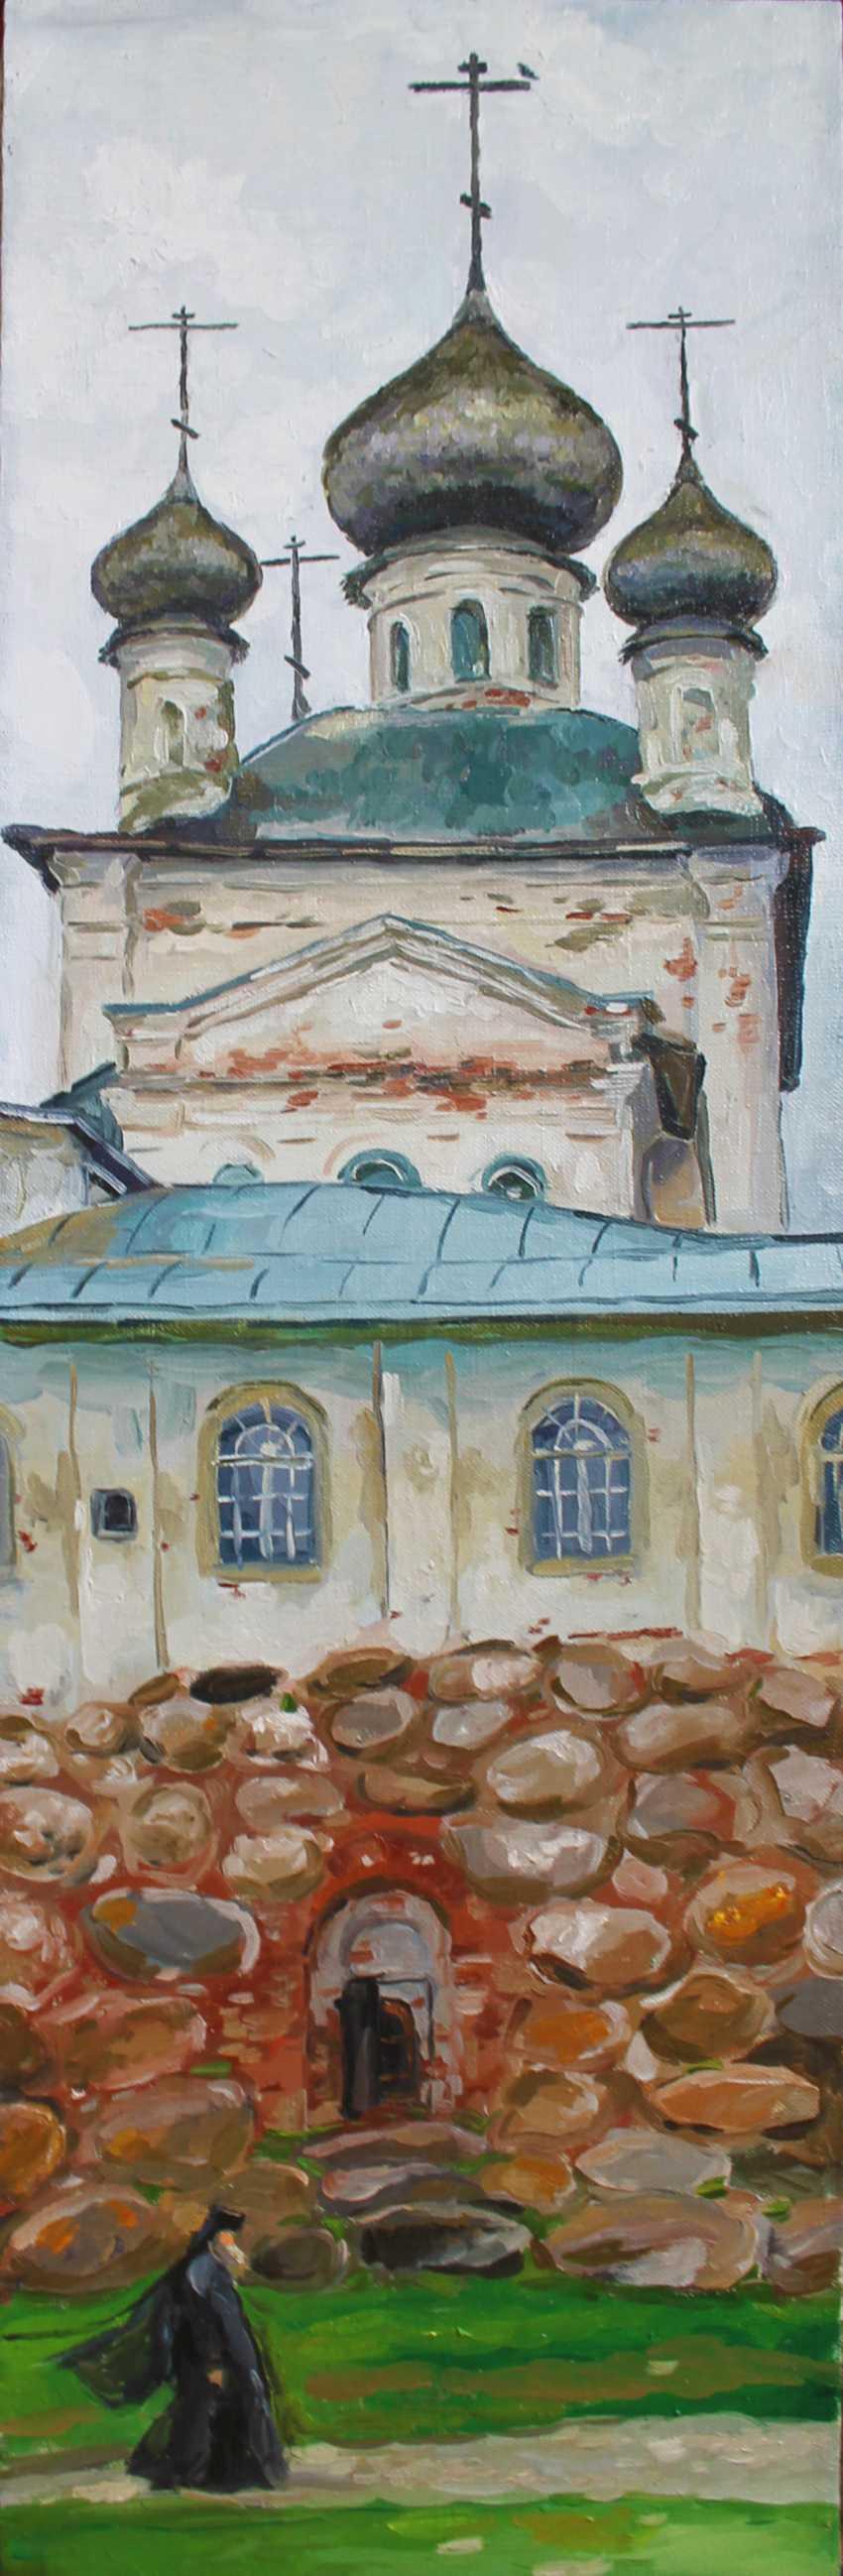 Natalia Myrauyova. The Church of St. Nicholas - photo 1